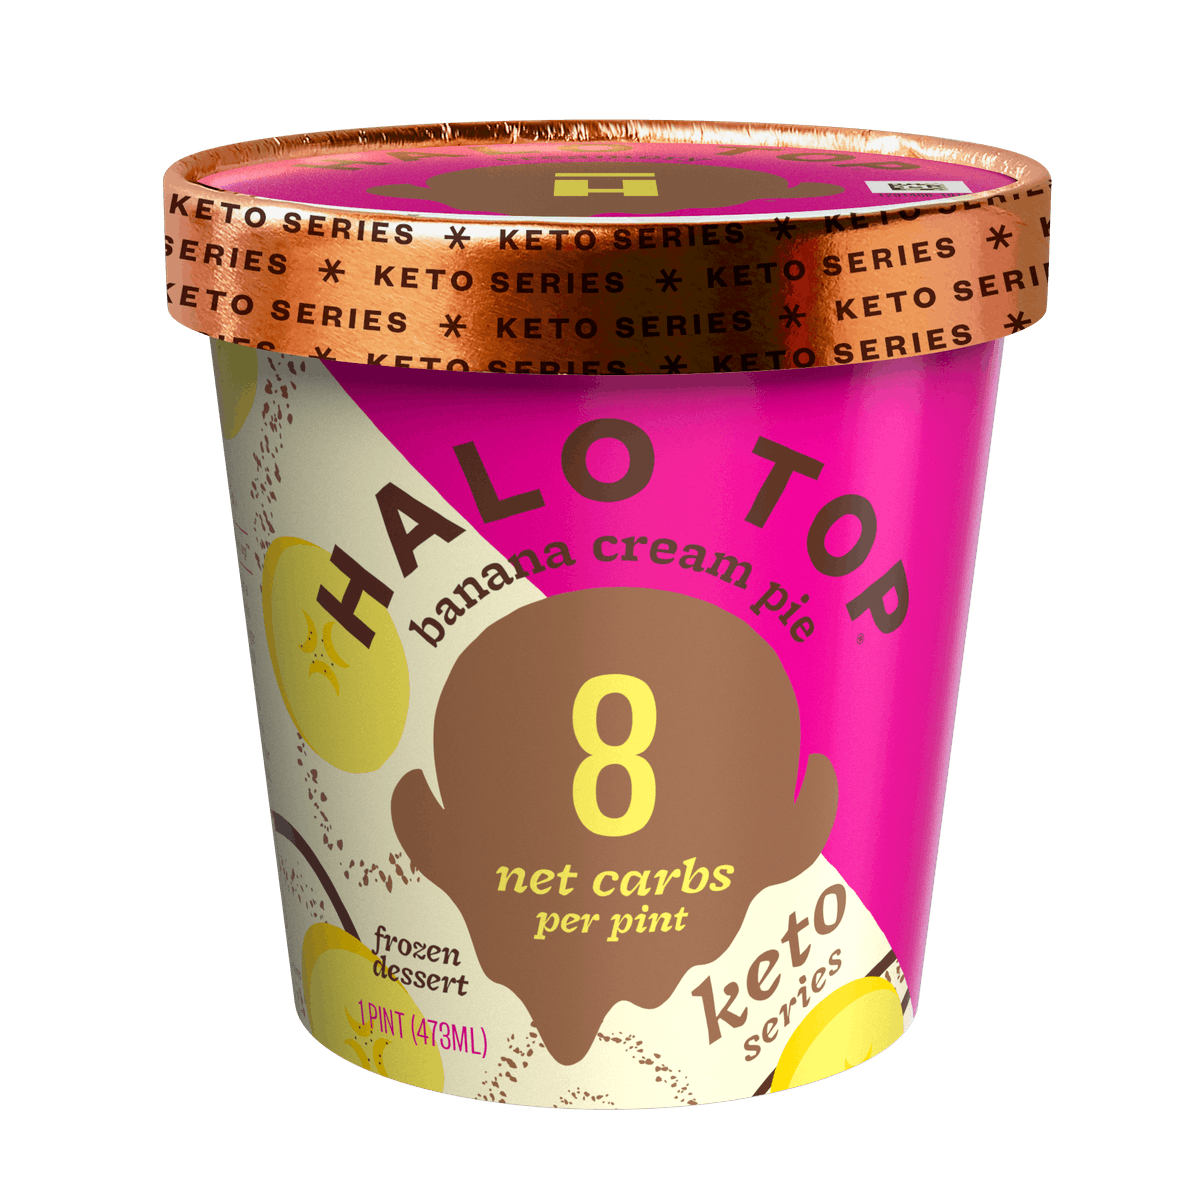 Halo Top's new Keto Series ice cream flavors include a Banana Cream Pie option.